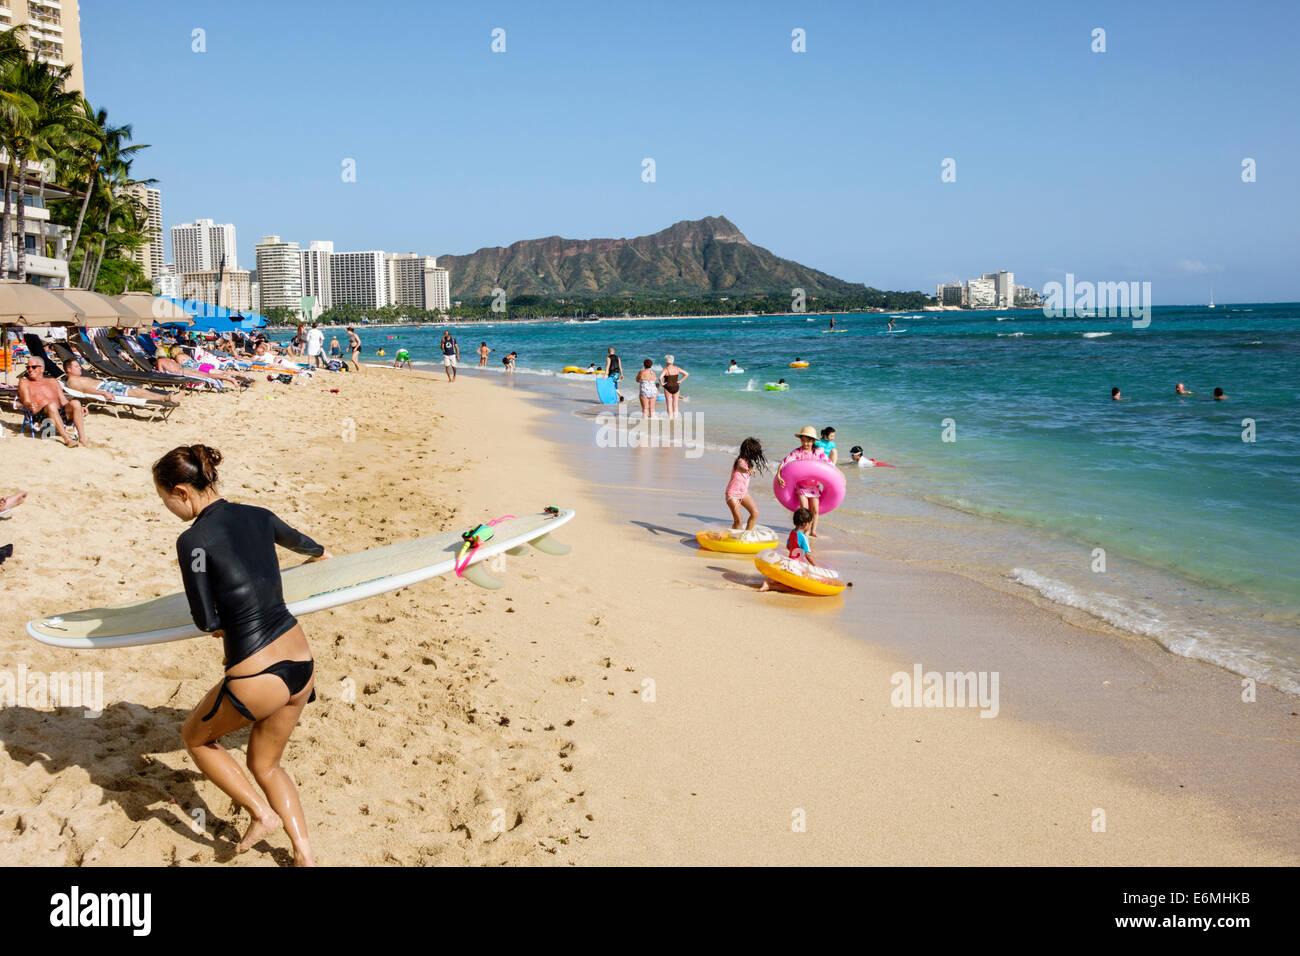 Waikiki Beach Honolulu Hawaii Hawaiian Oahu Pacific Ocean Bay Diamond Head Crater Extinct Volcano Mountain Sunbathers Waterfront Hotel Asian W